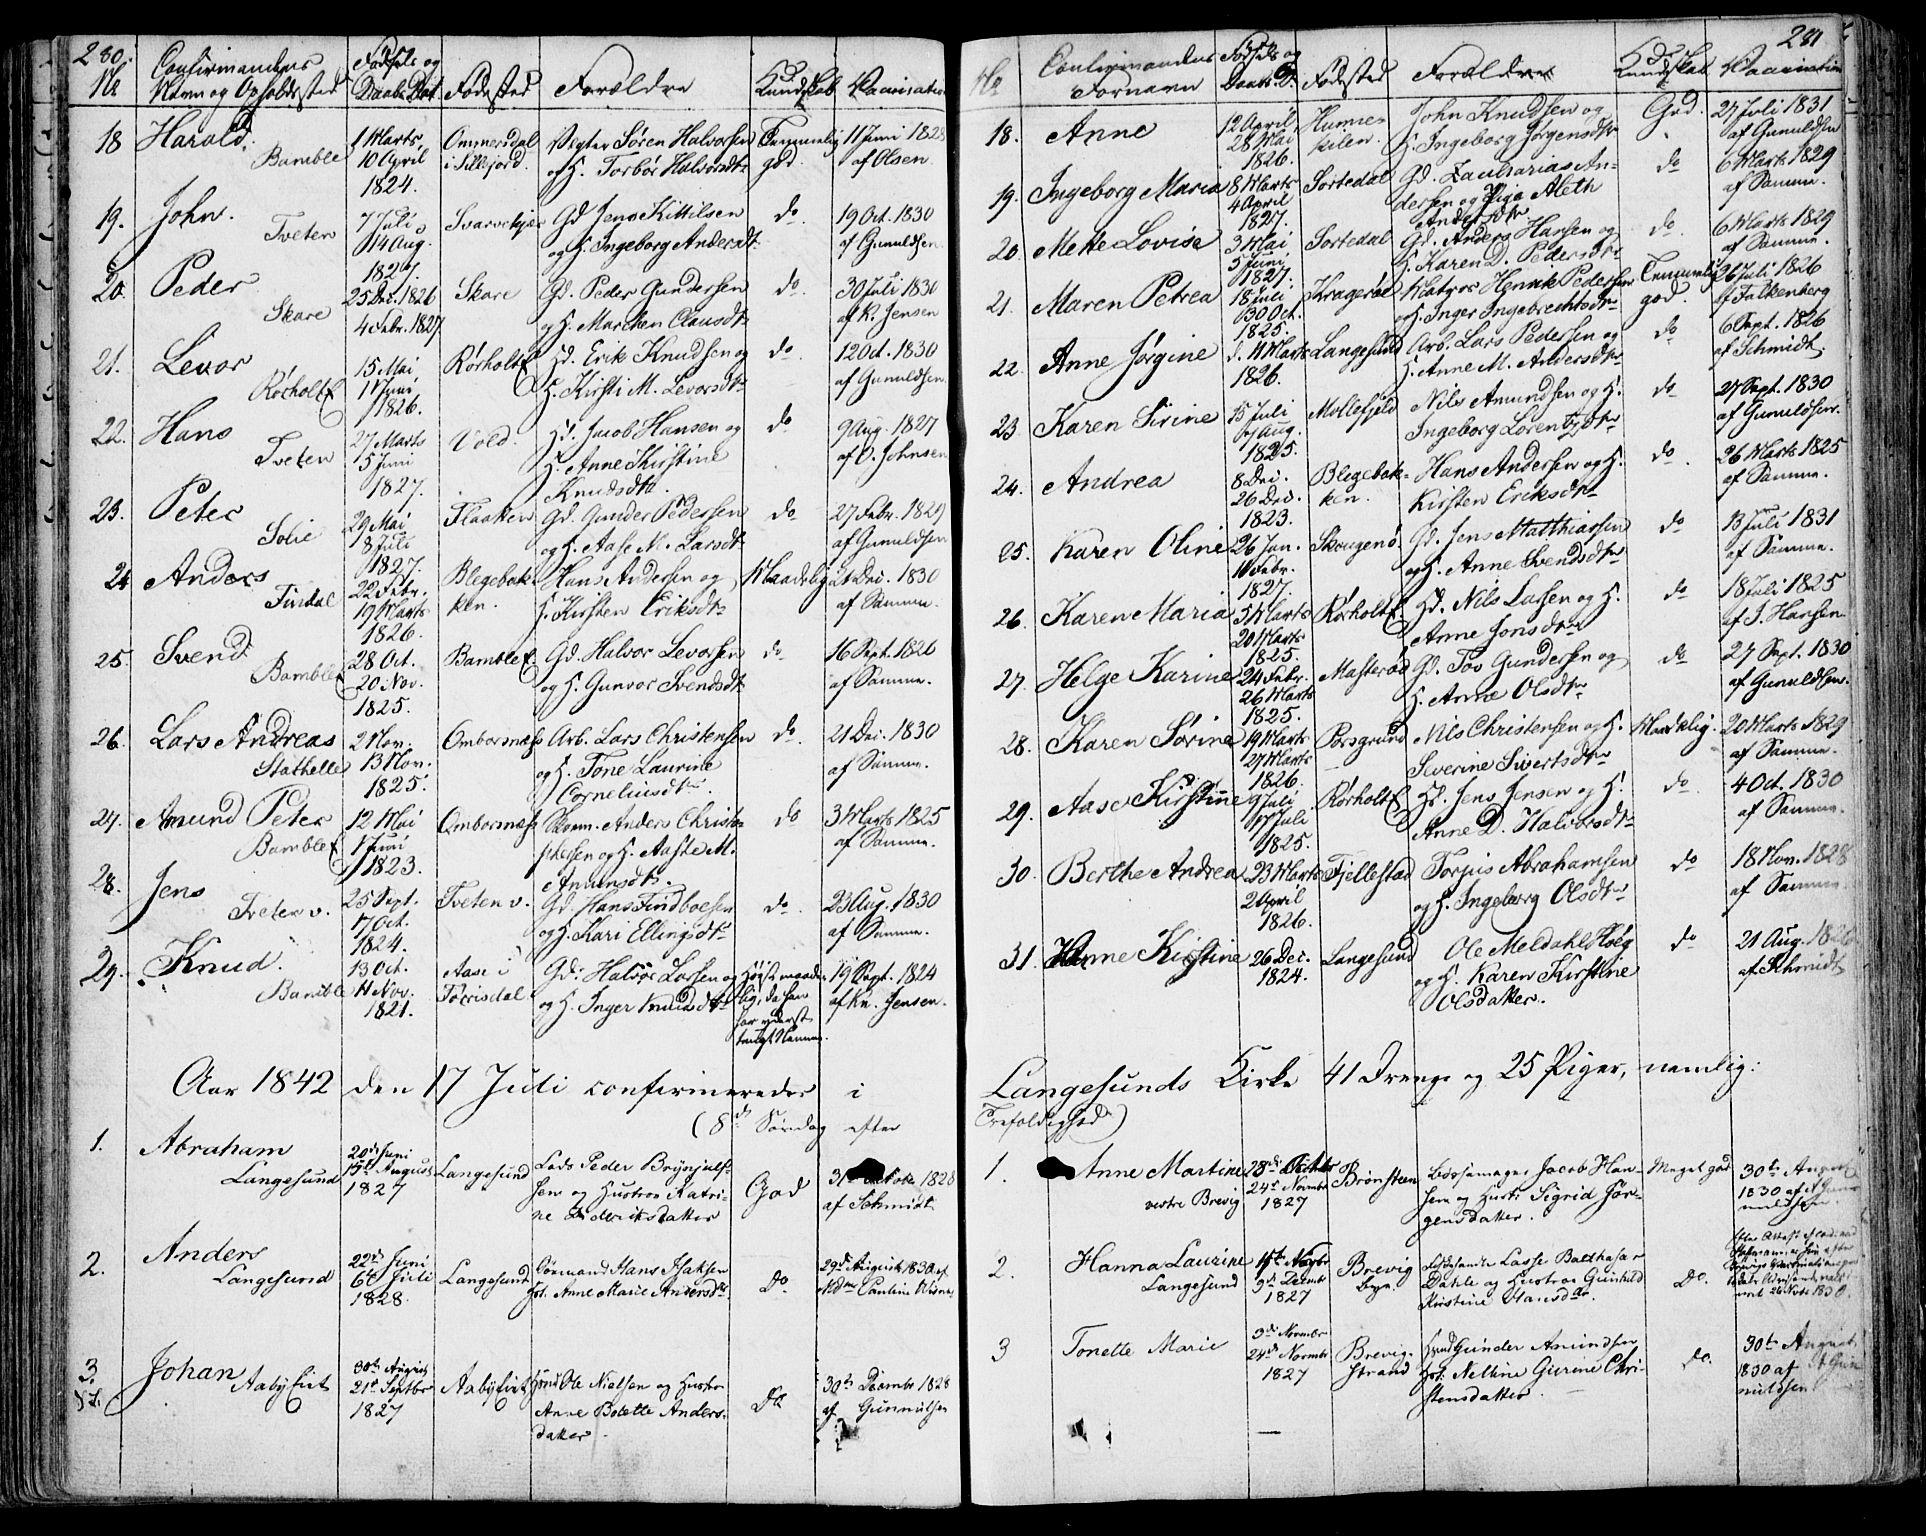 SAKO, Bamble kirkebøker, F/Fa/L0004: Ministerialbok nr. I 4, 1834-1853, s. 280-281